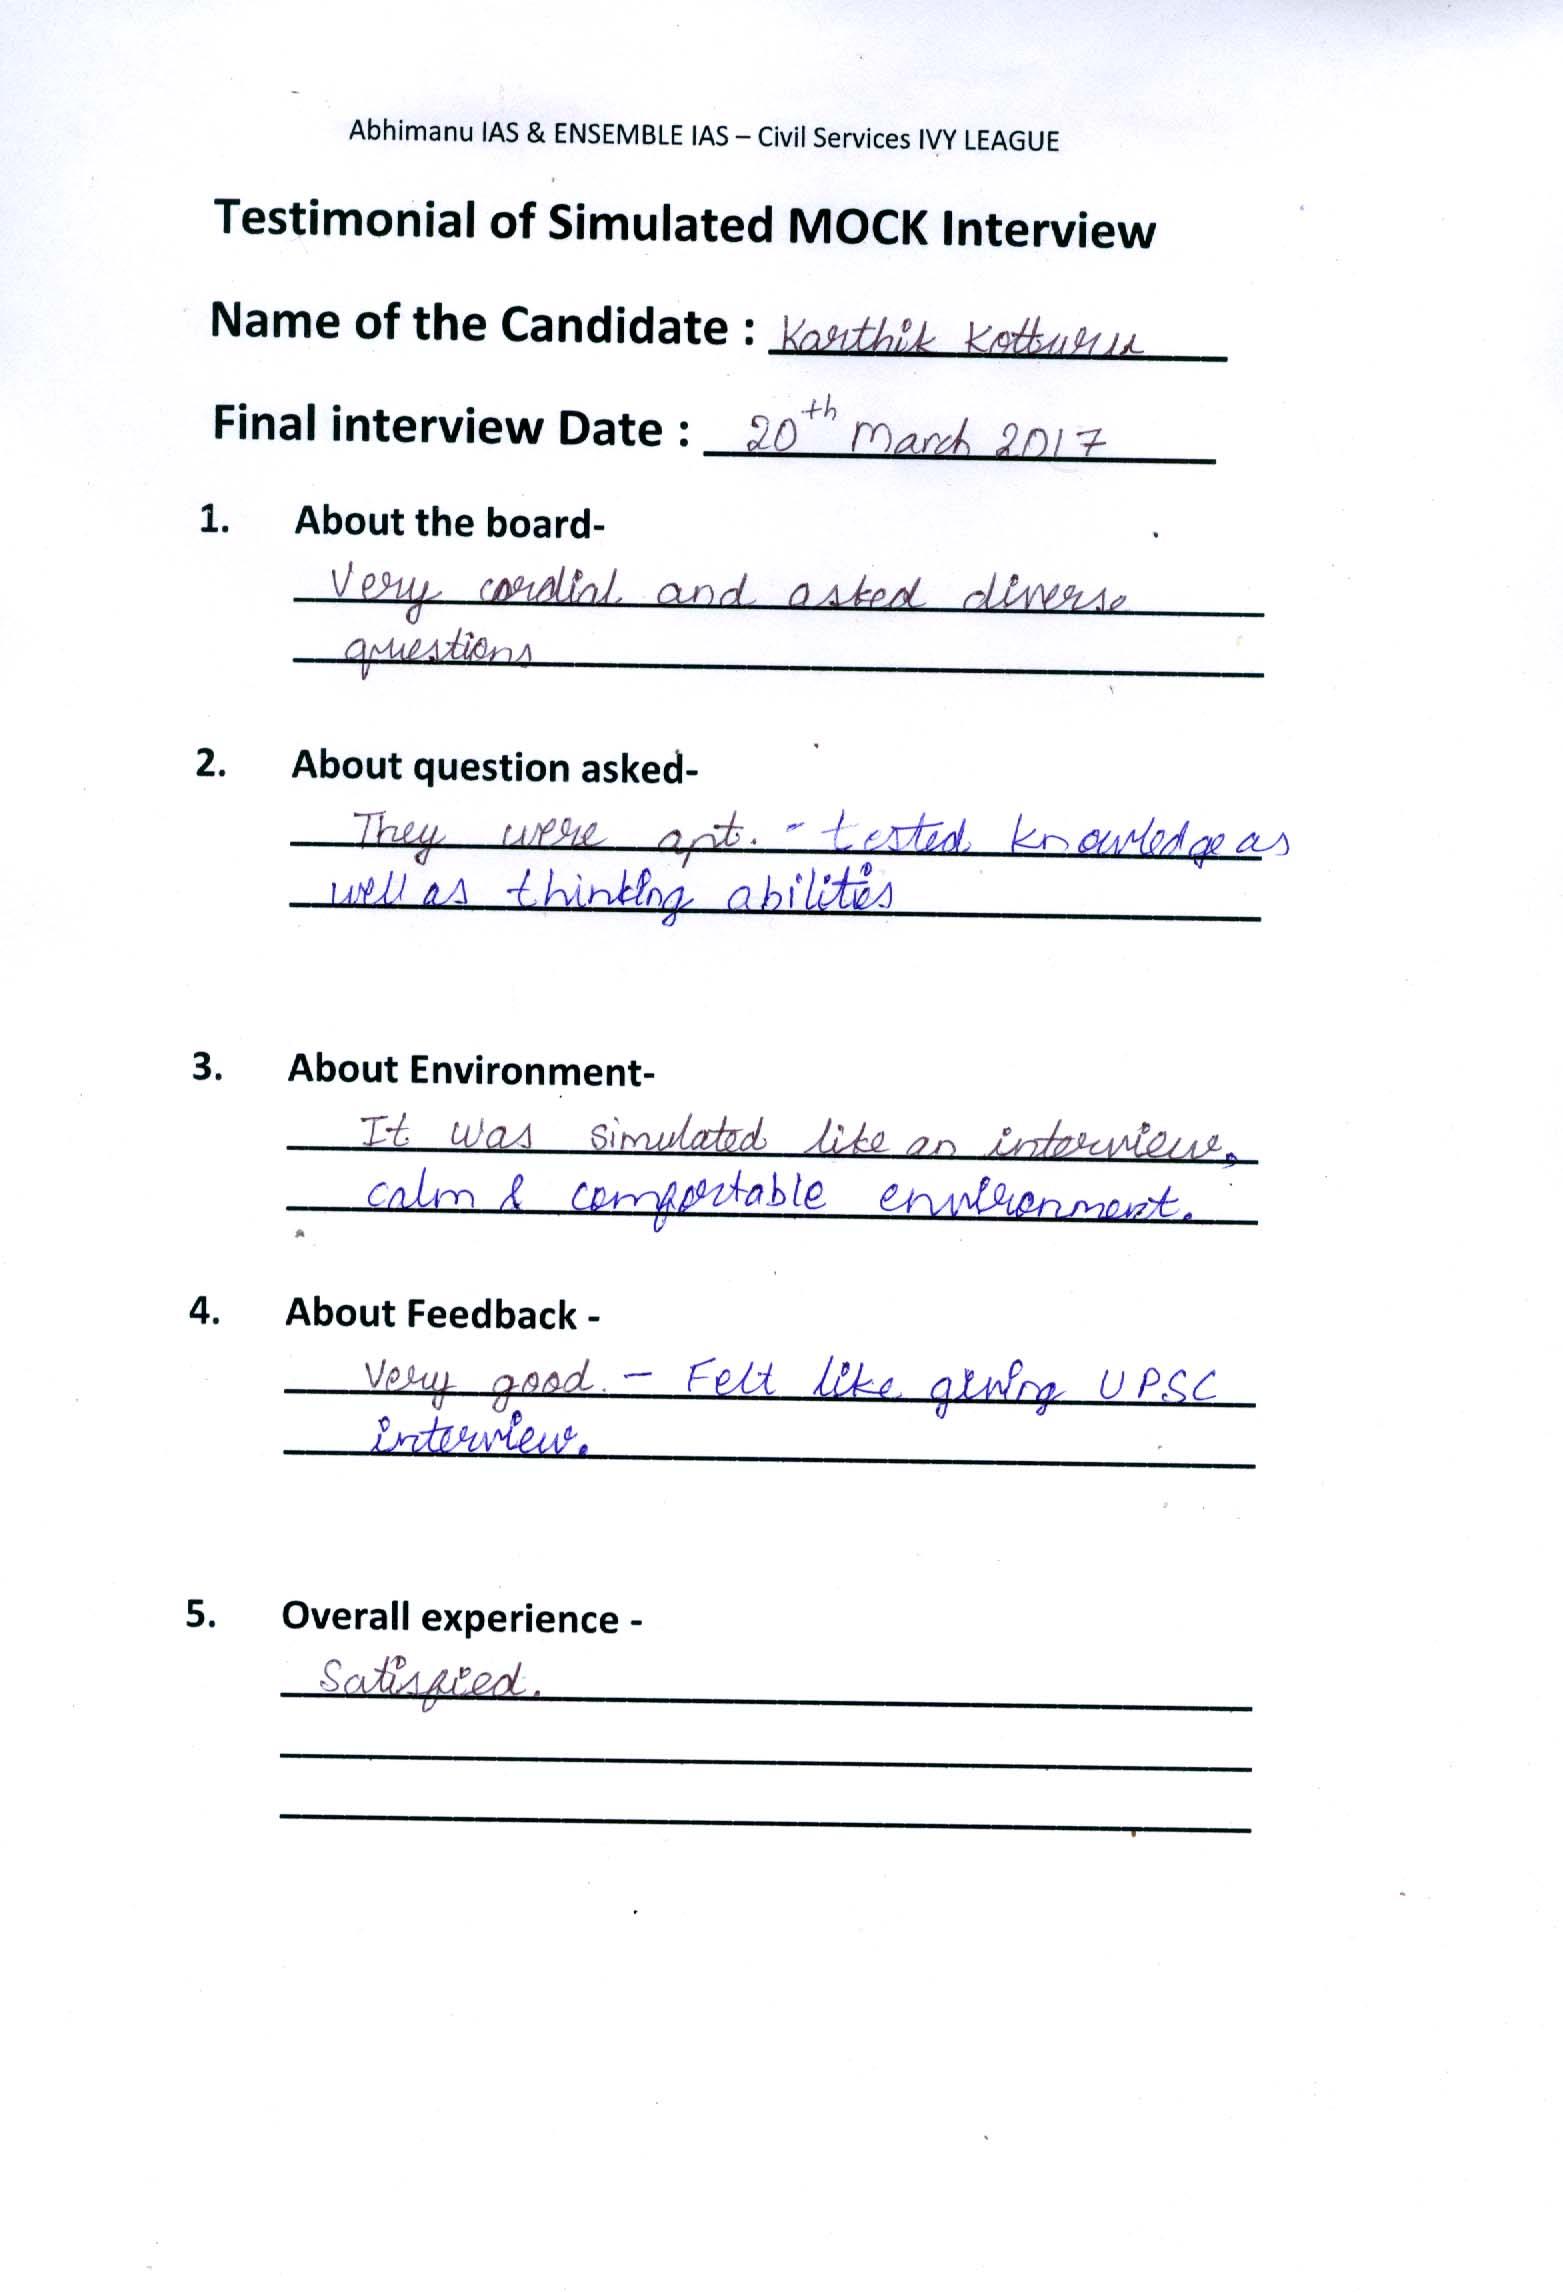 Interview Testimonial By- Karthik Kottoru